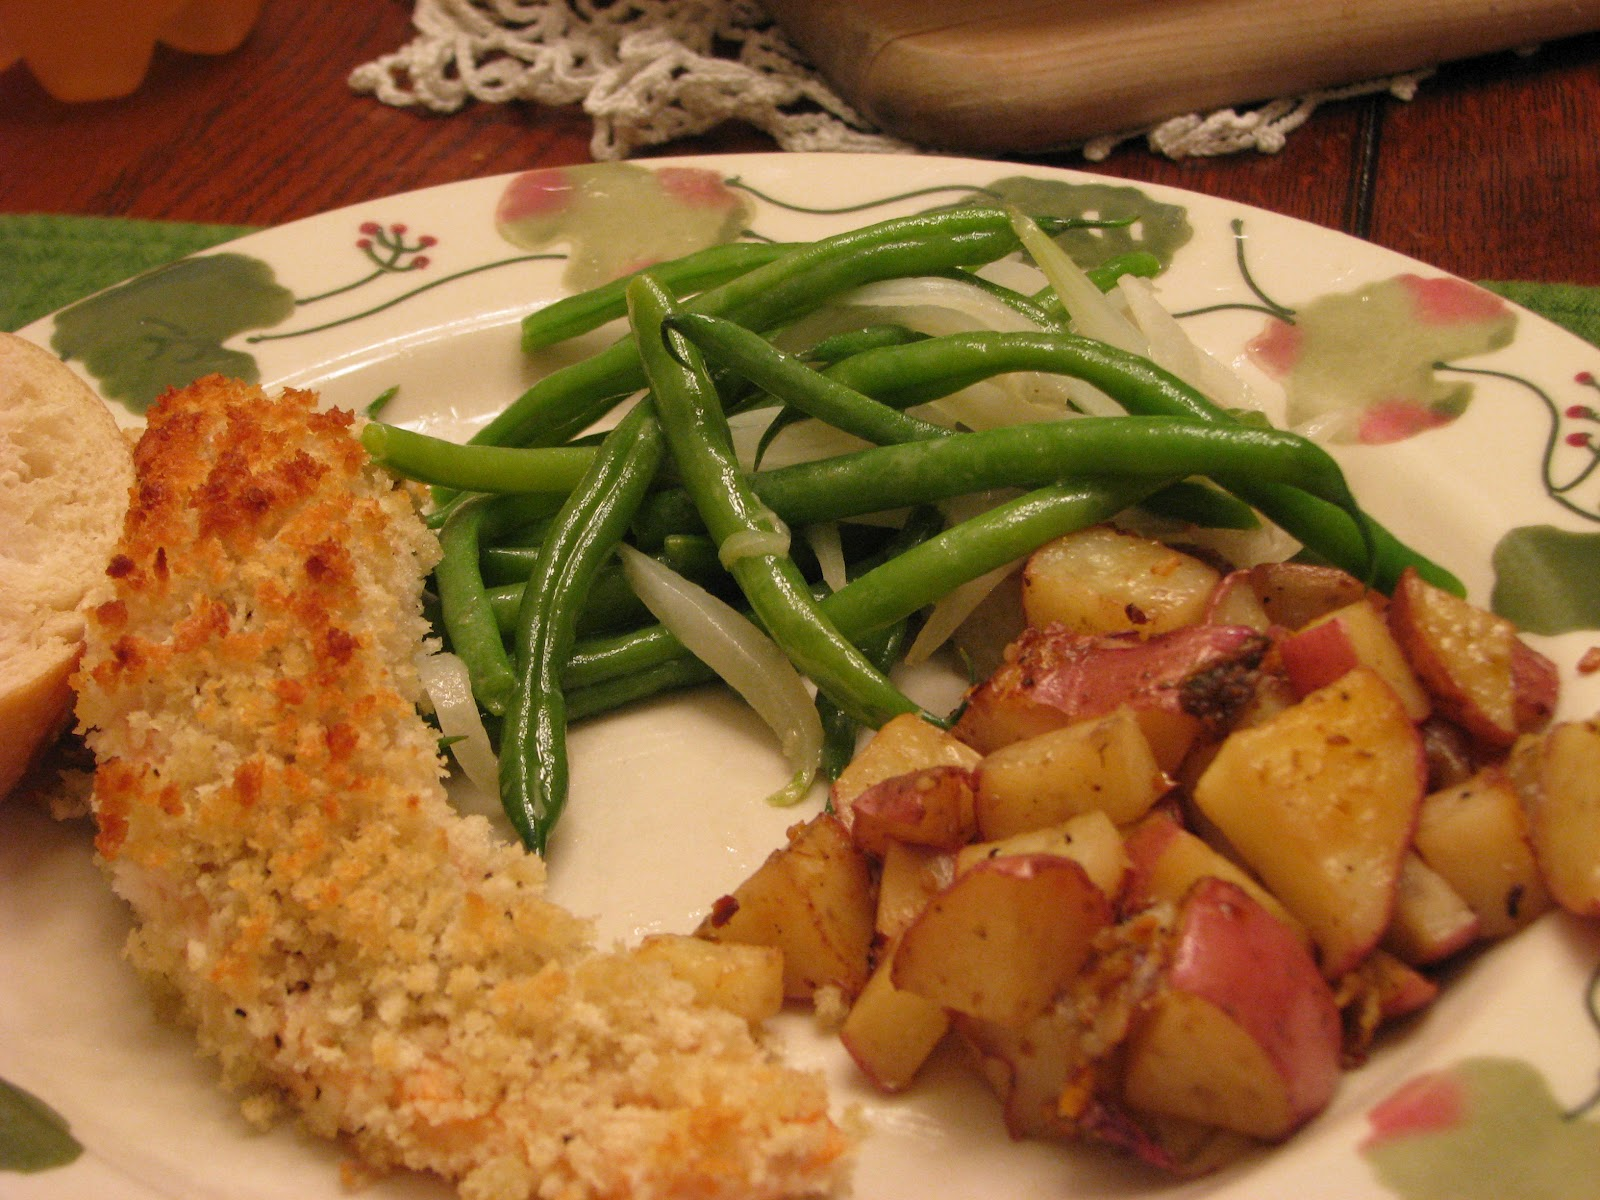 TheFultonGirls: Honey Mustard Salmon w/Green Beans